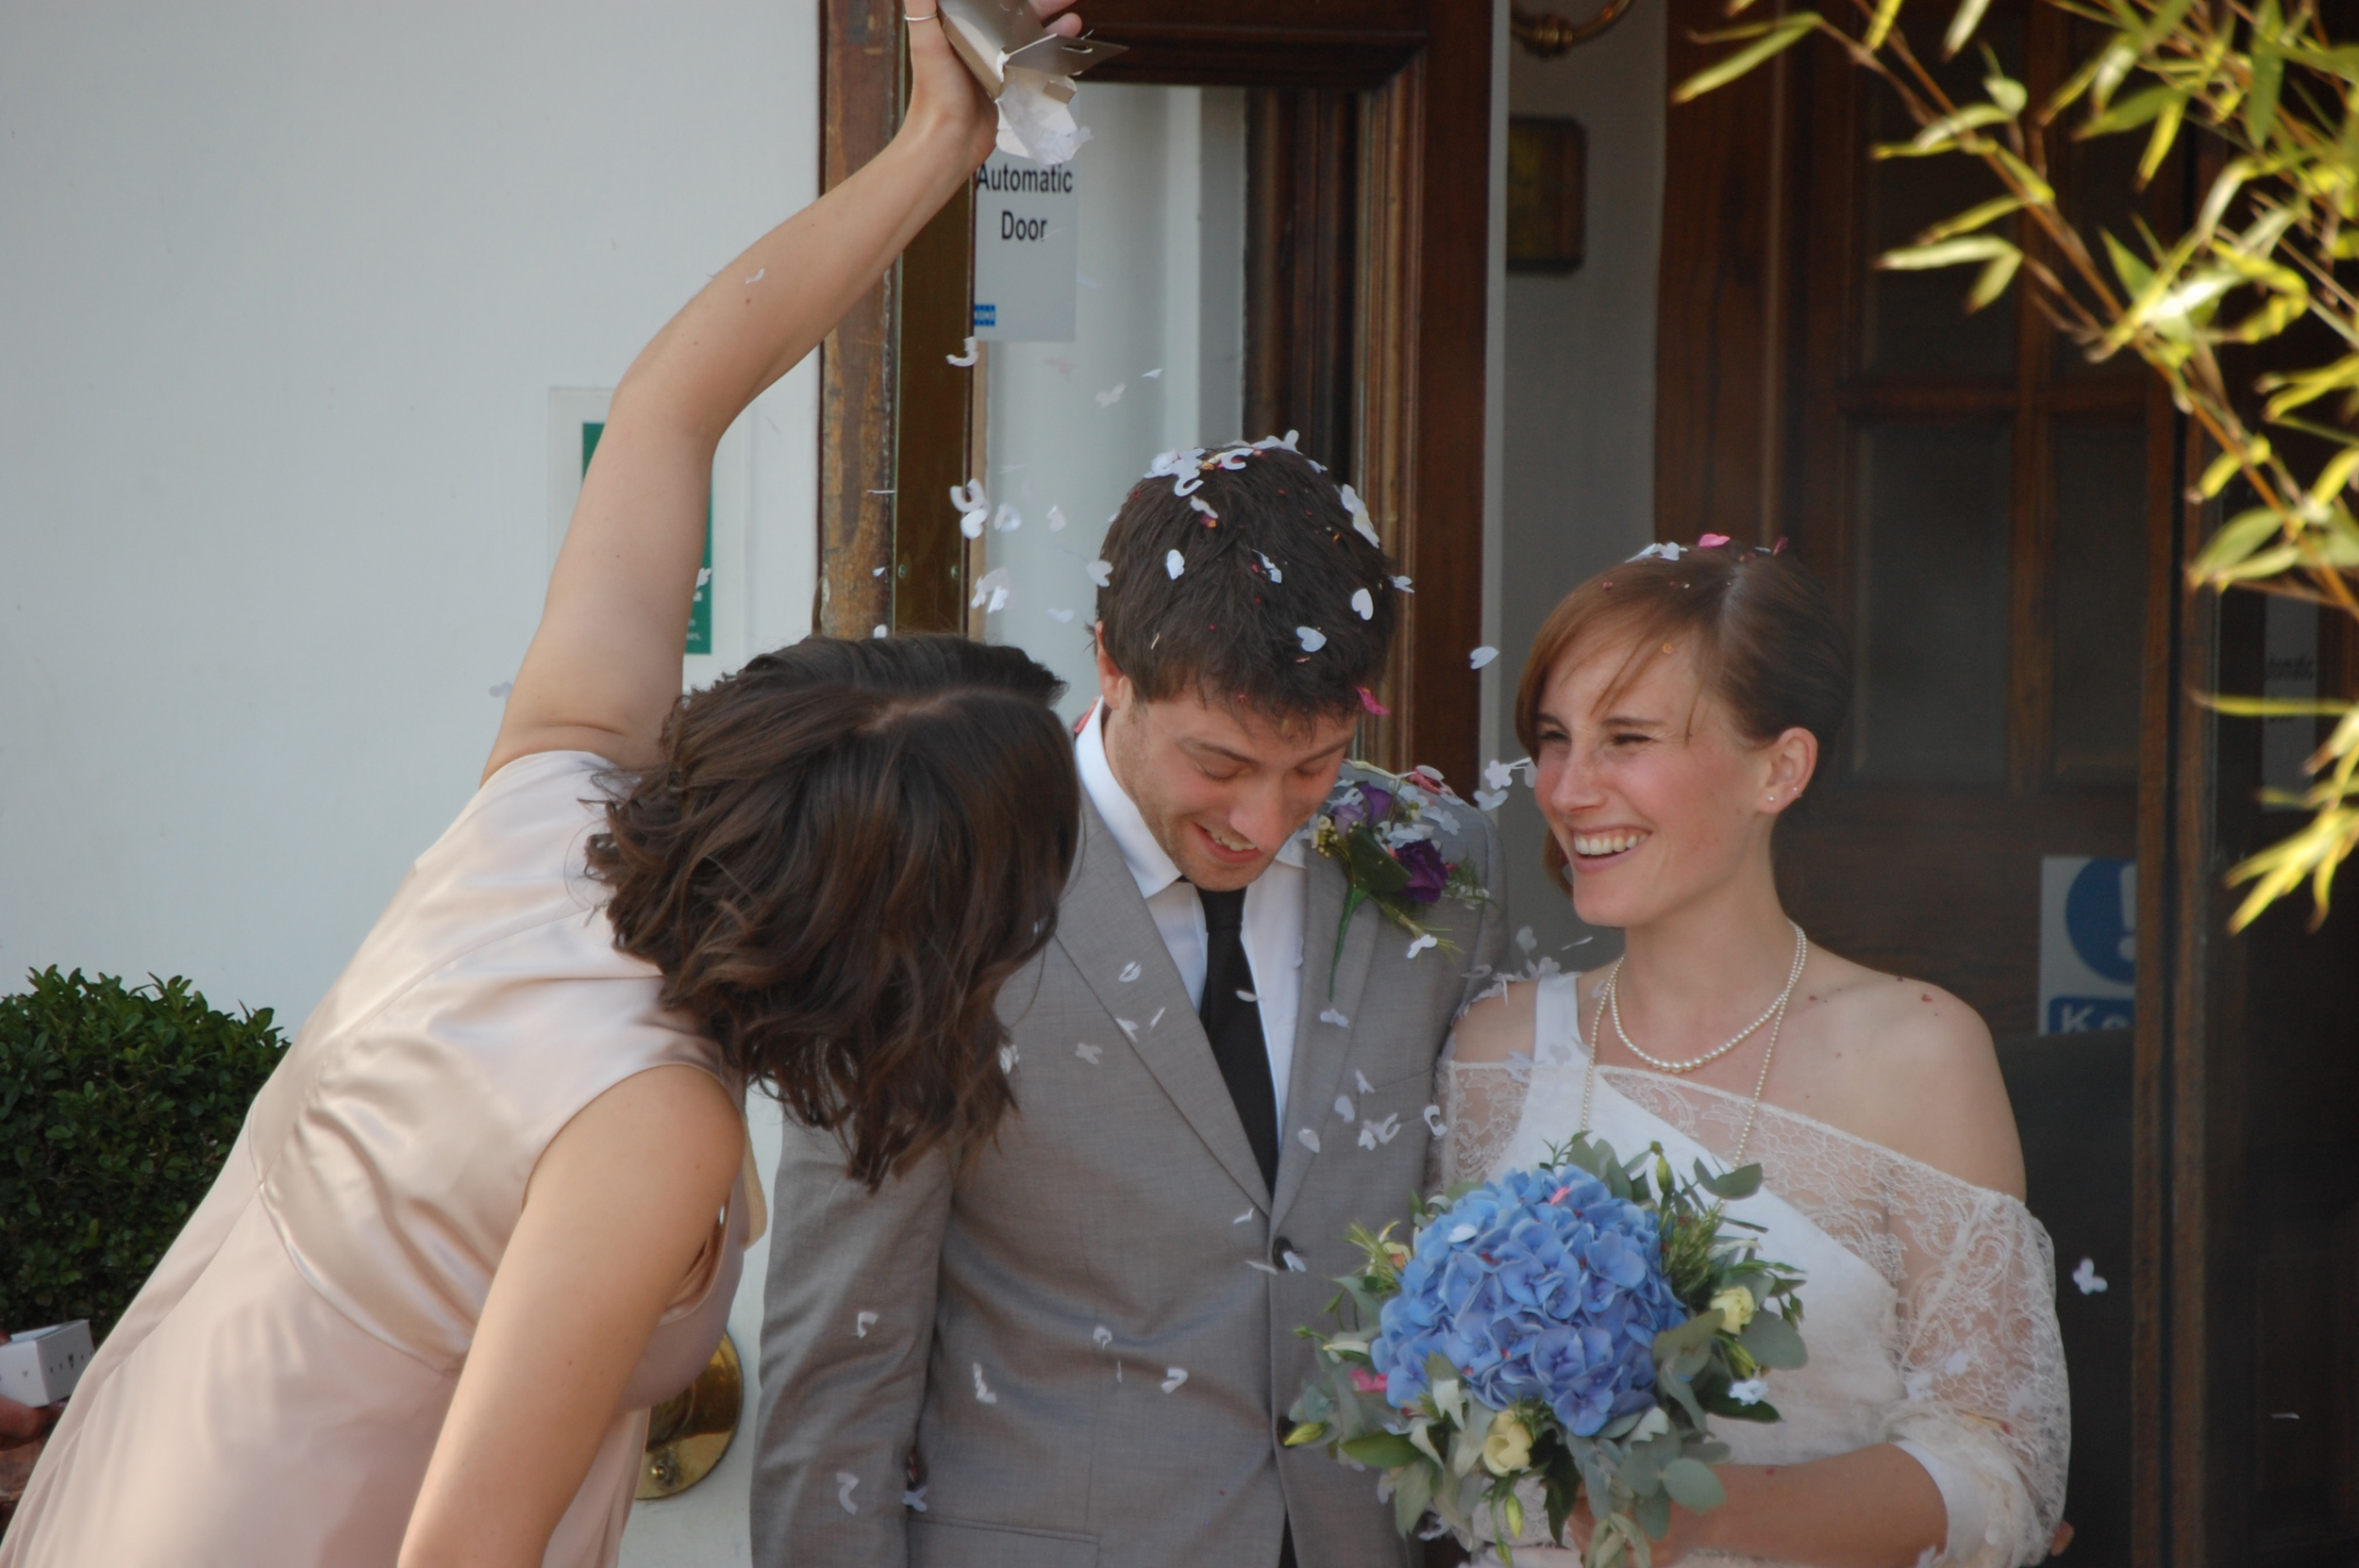 Alexandra-bespoke-wedding-dress-Kate-Beaumont-13.jpg